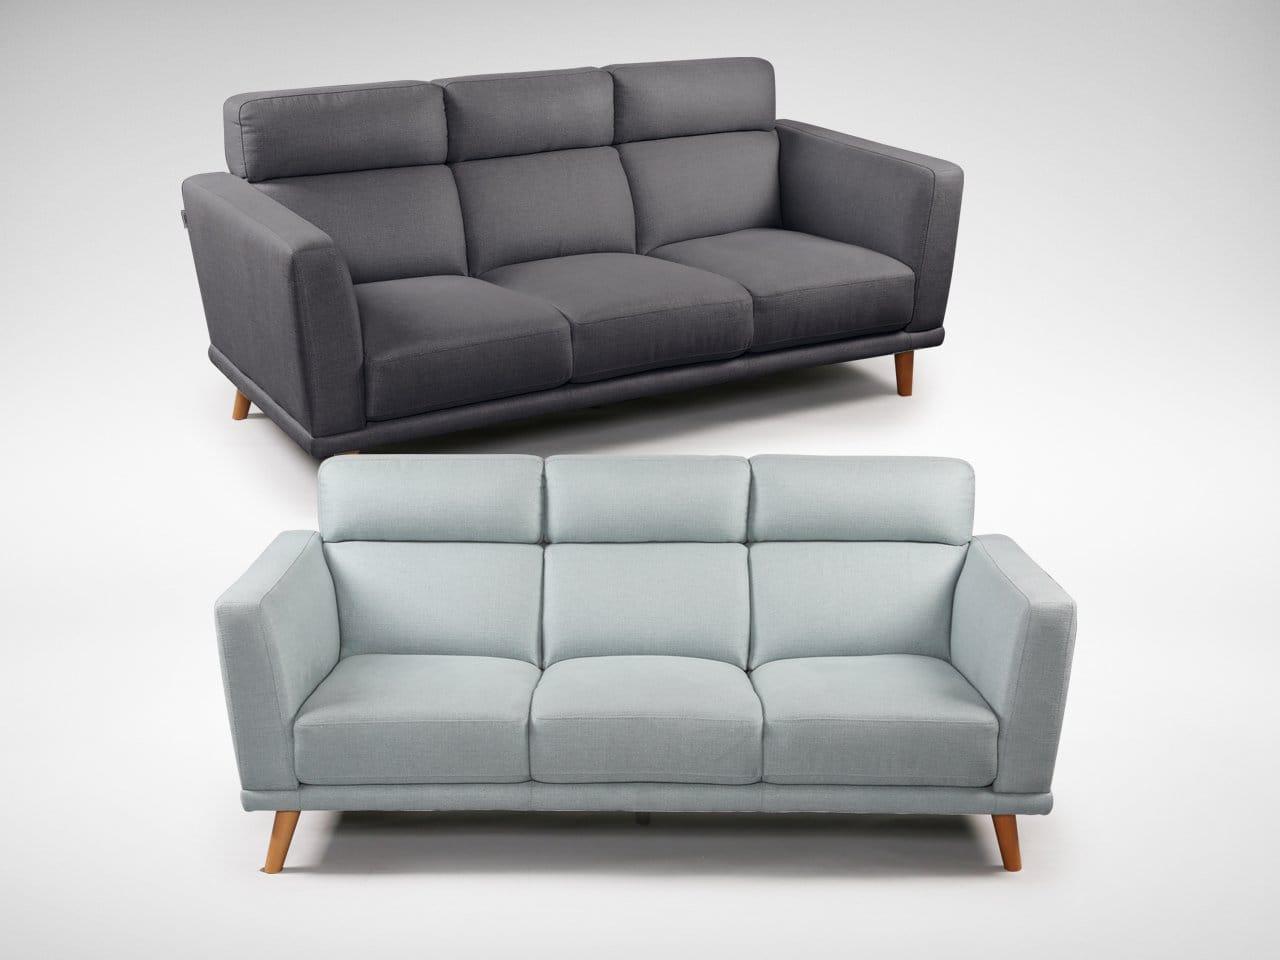 2 seater sofa singapore vinyl arm covers fabric brokeasshome